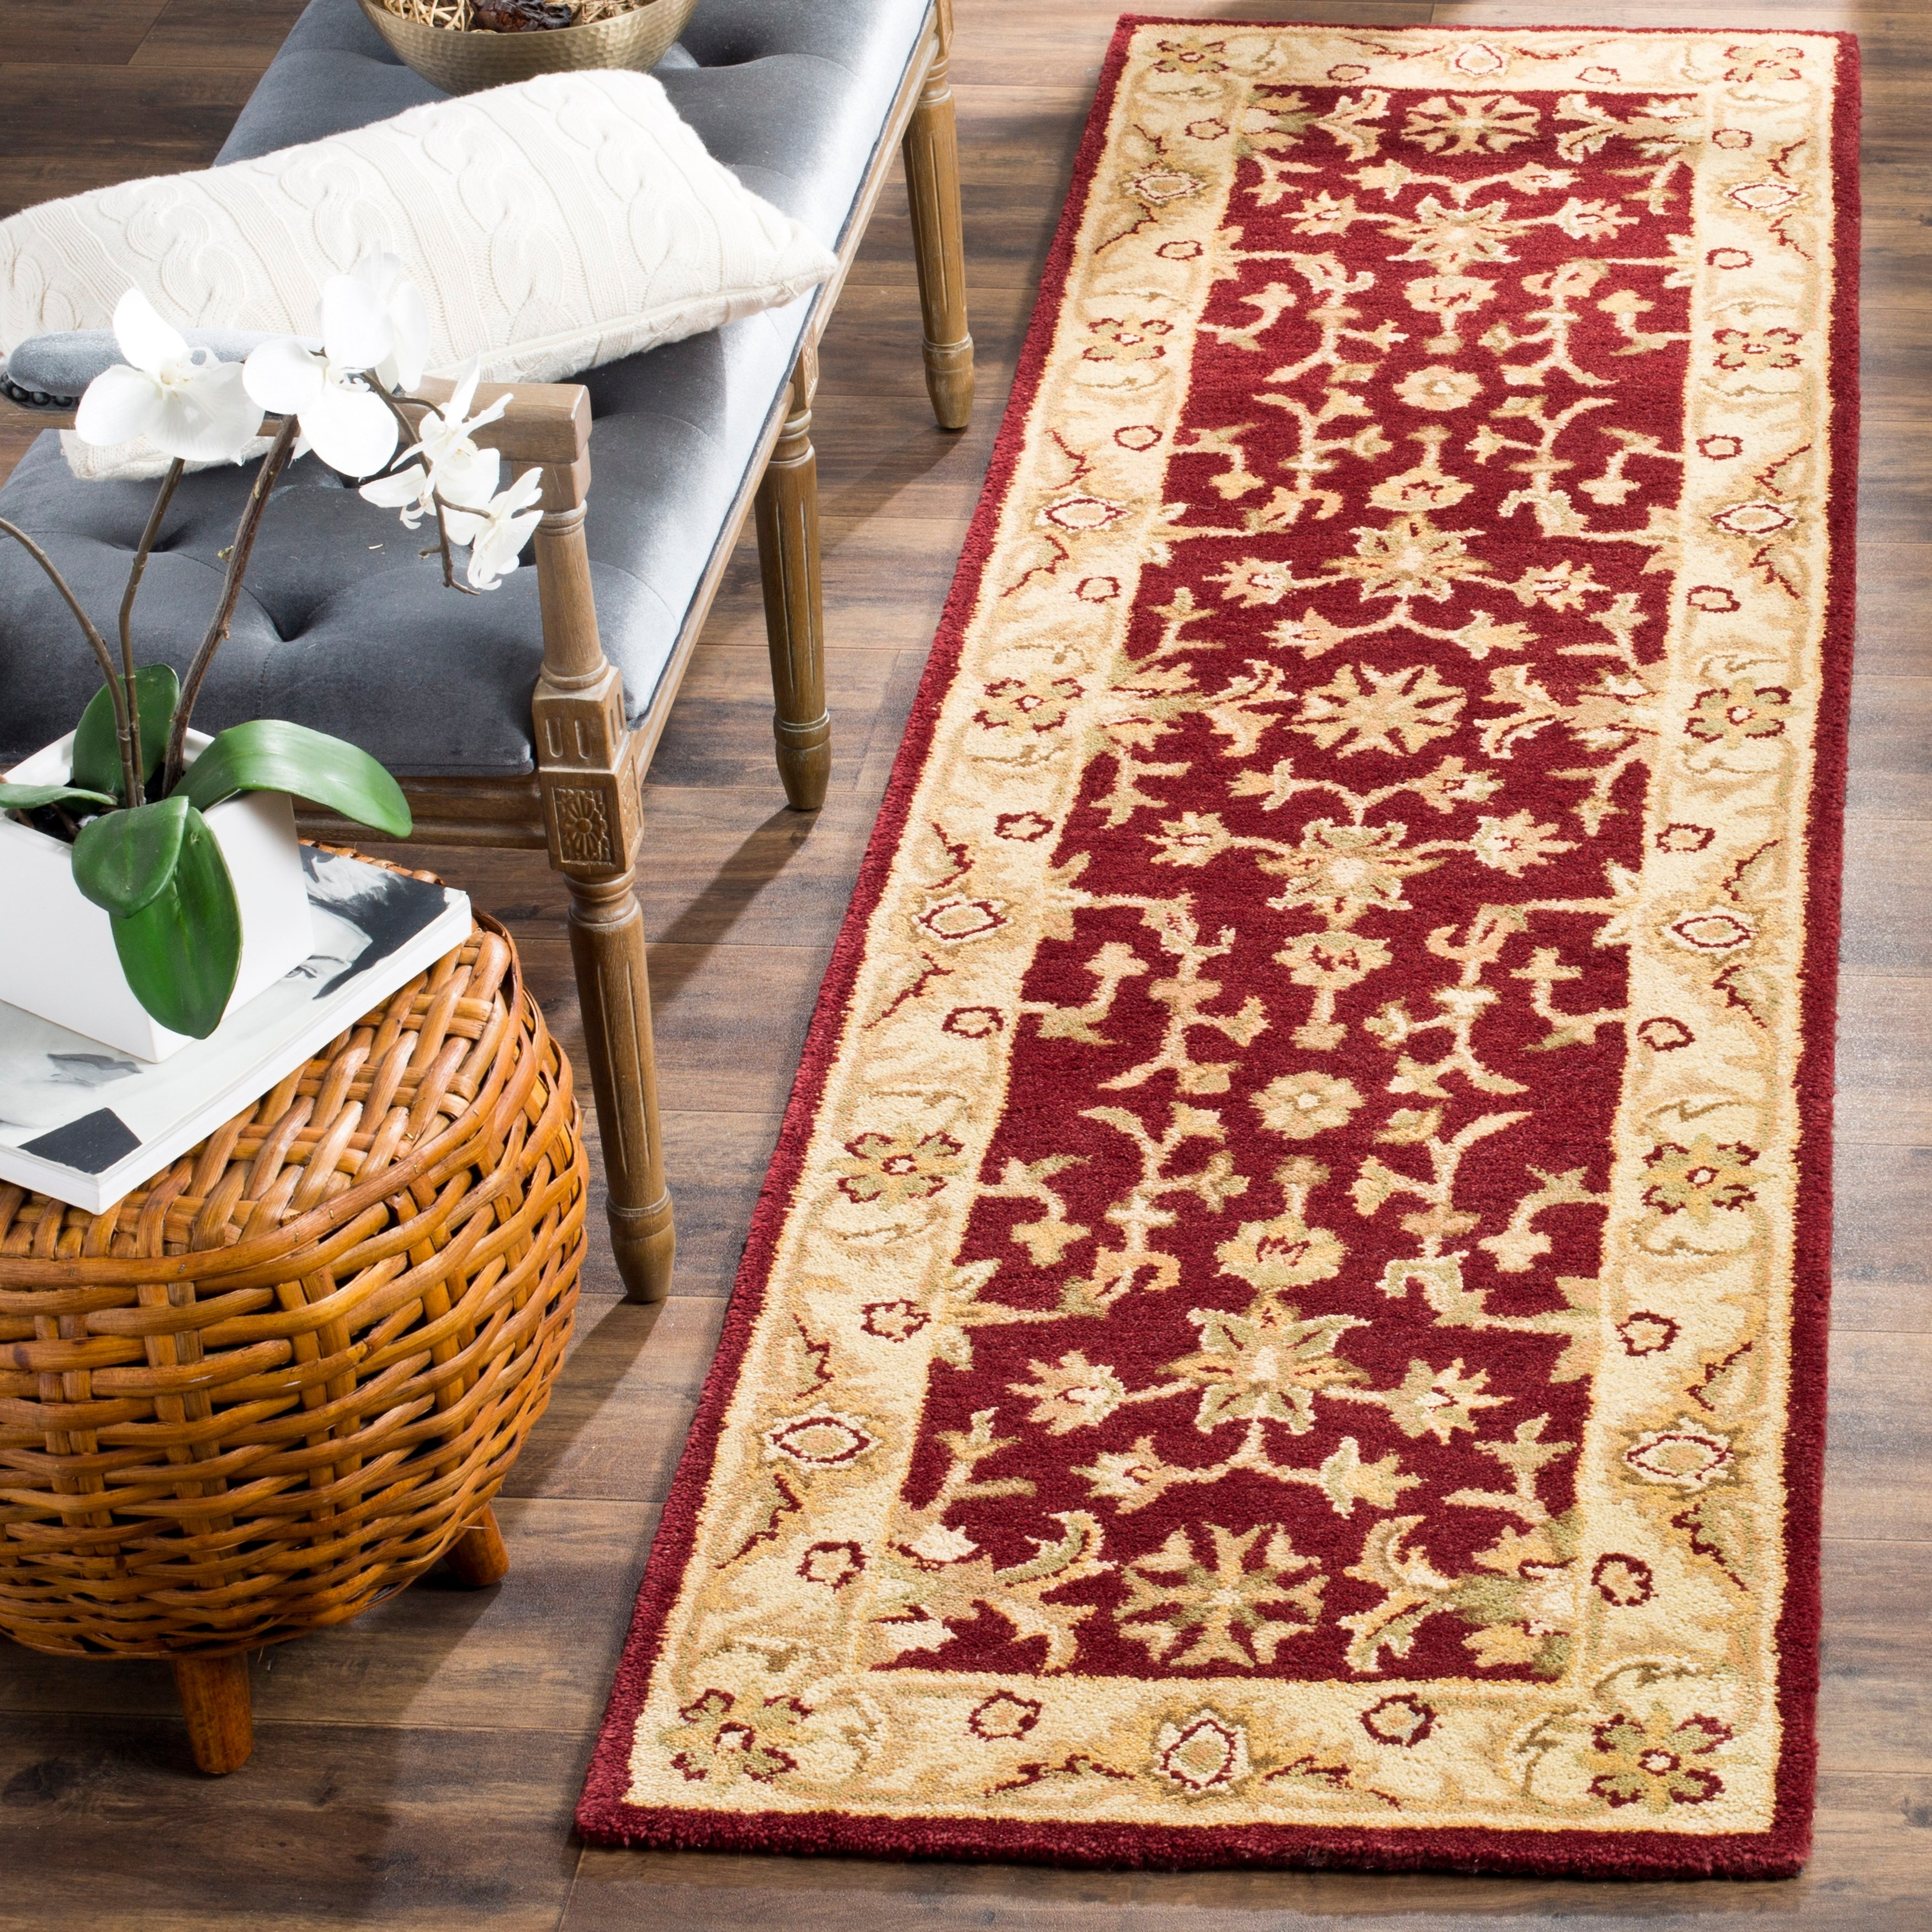 Safavieh-Handmade-Antiquity-Vena-Traditional-Oriental-Wool thumbnail 15